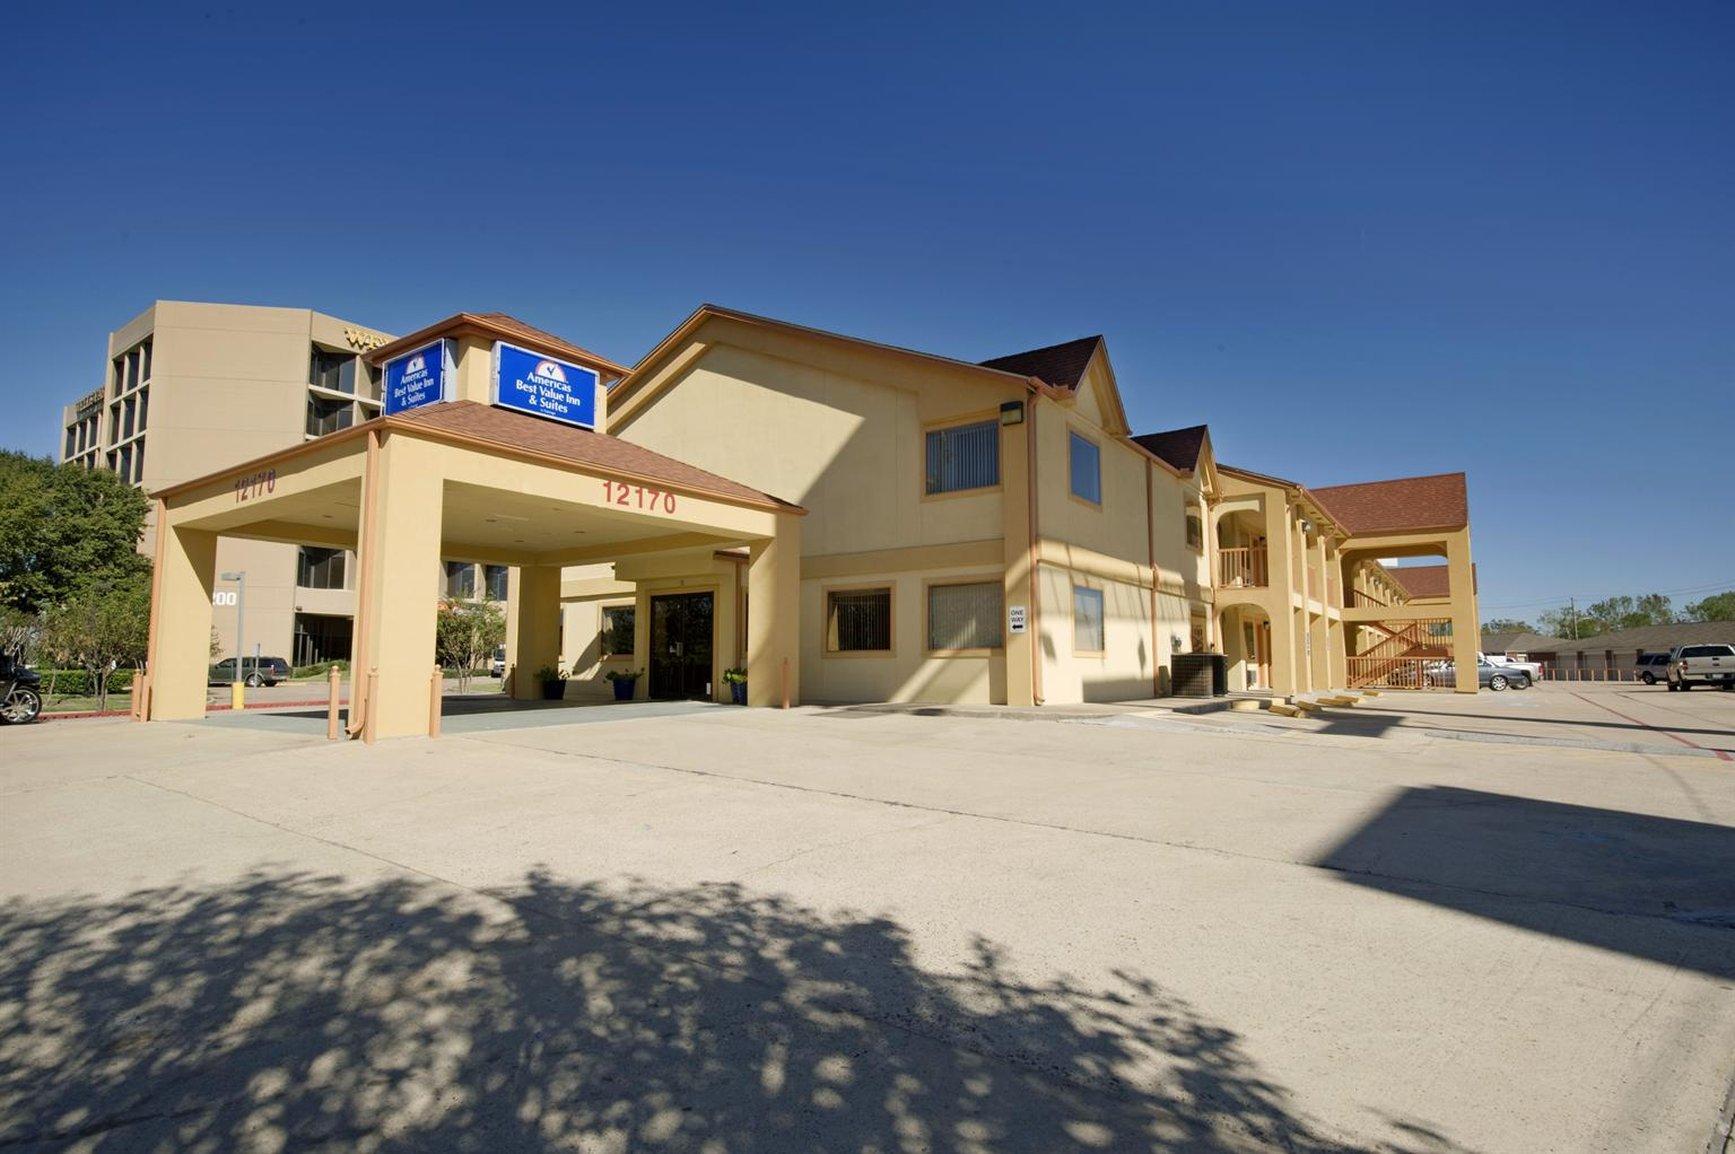 Americas Best Value Inn & Suites - Houston/Northwest